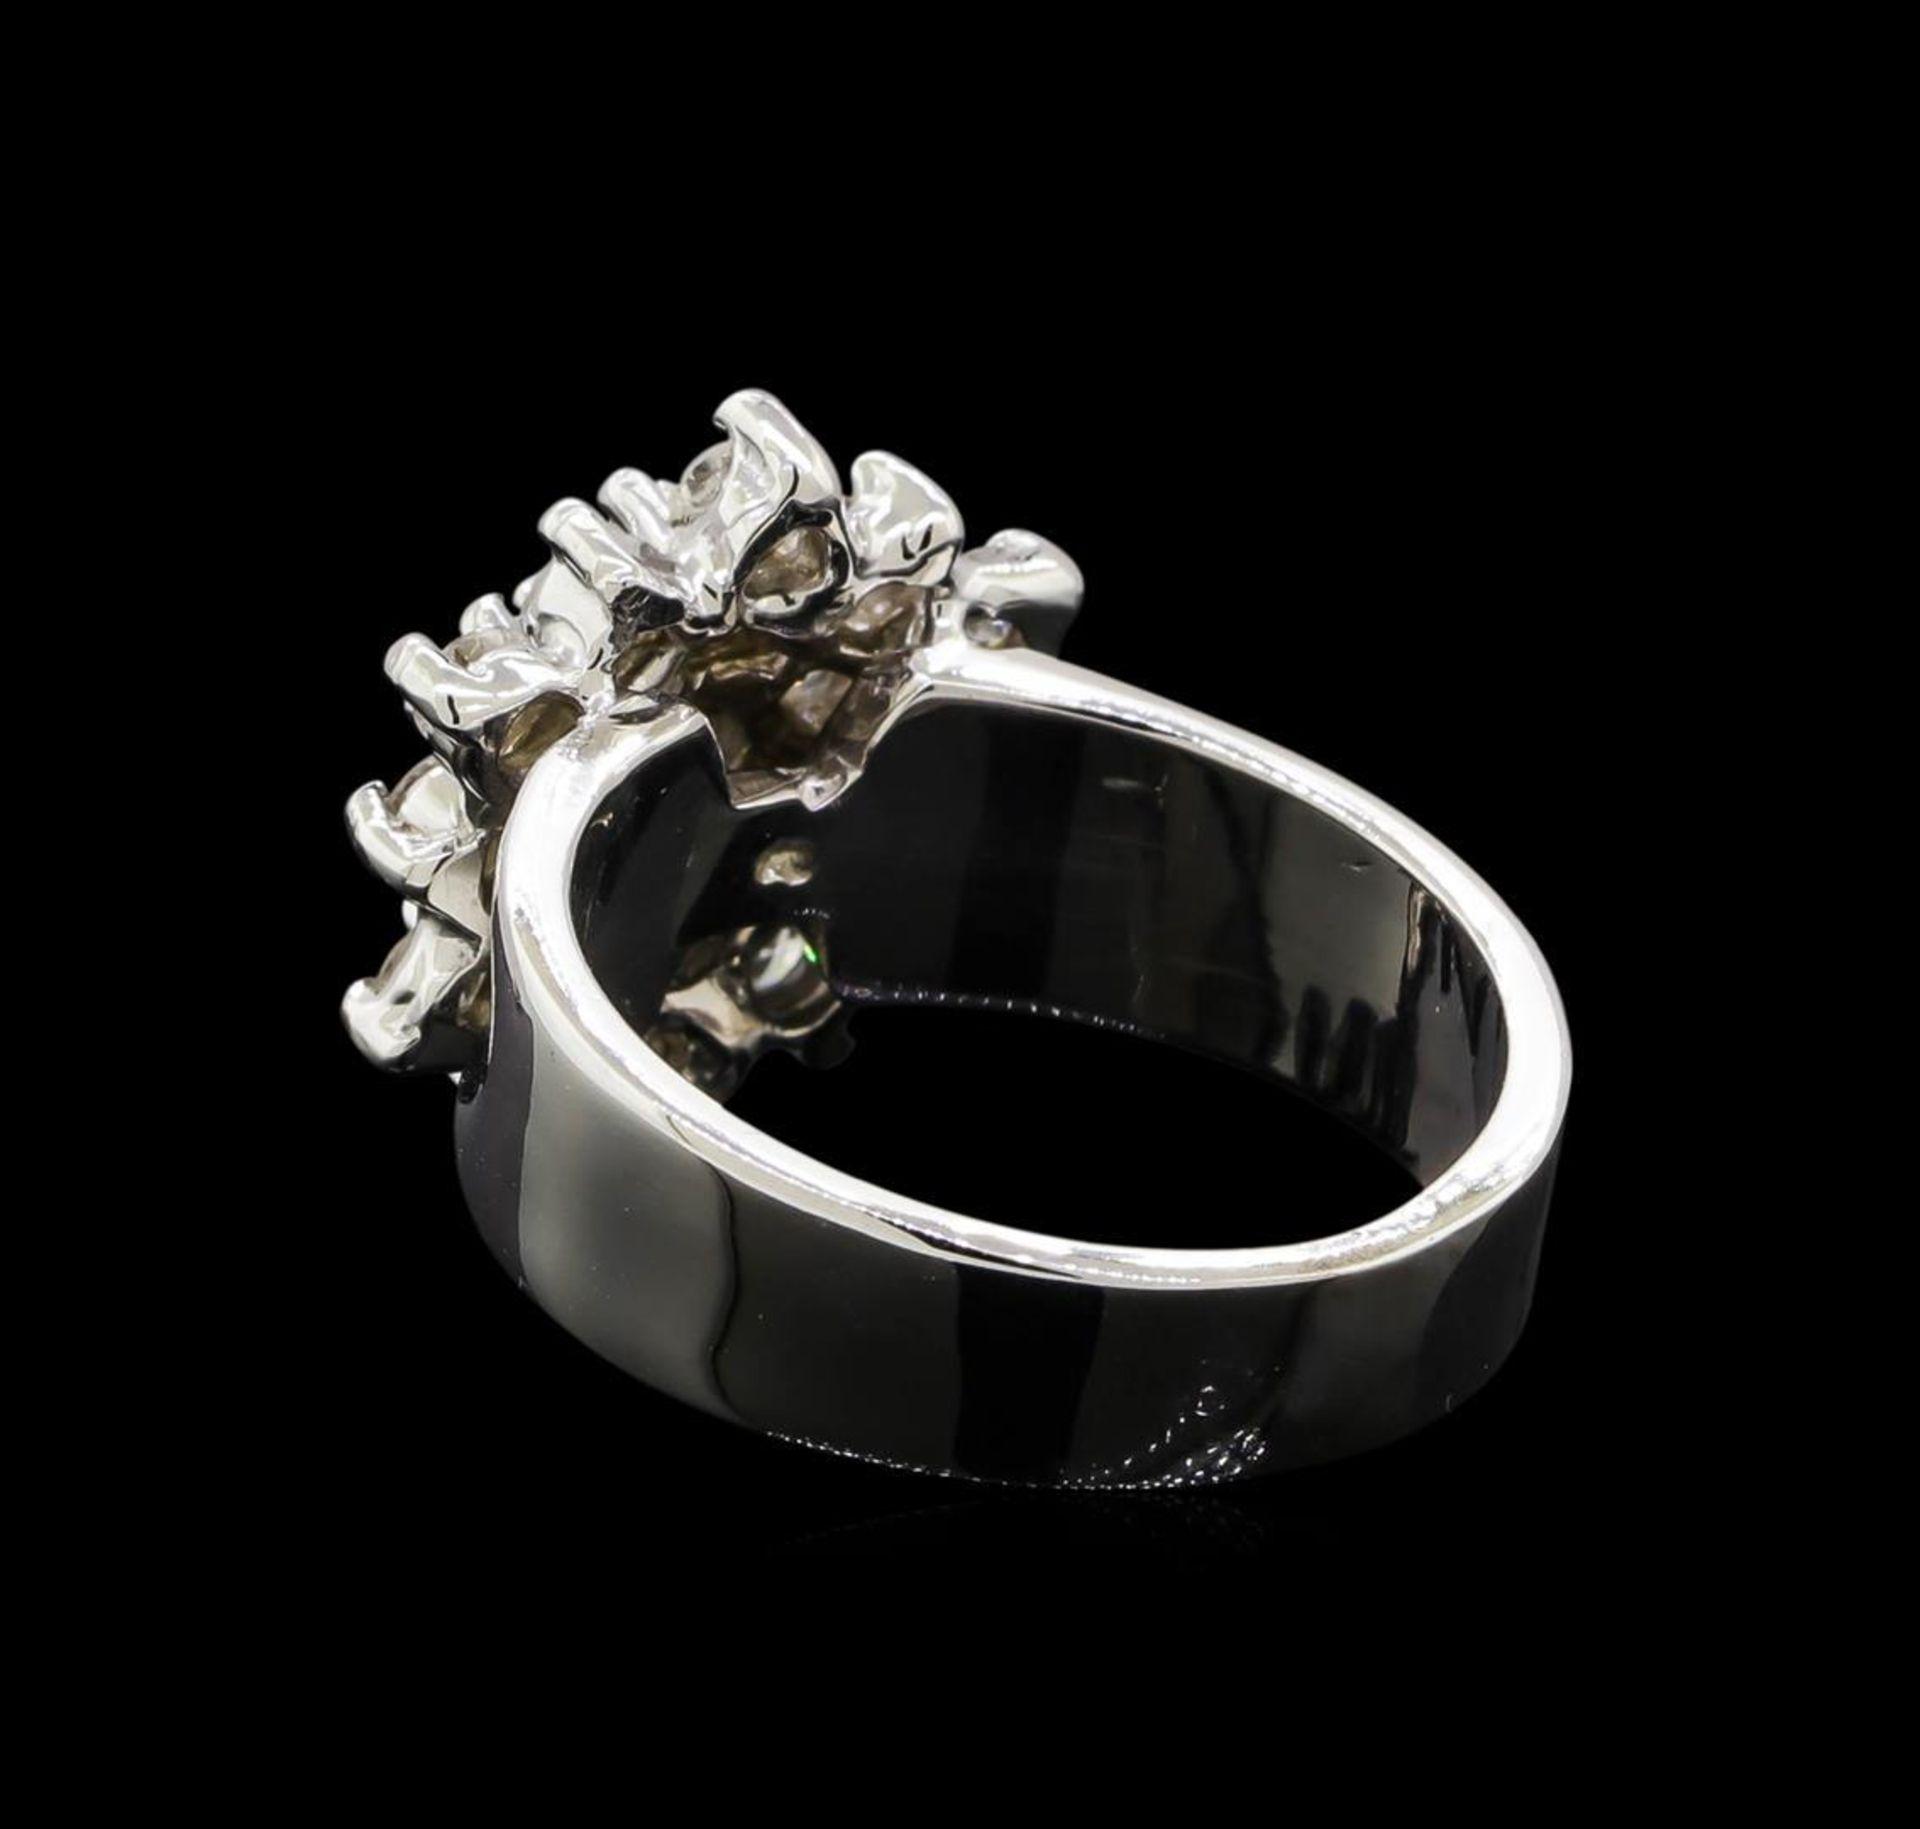 14KT White Gold 1.55 ctw Diamond Ring - Image 3 of 5